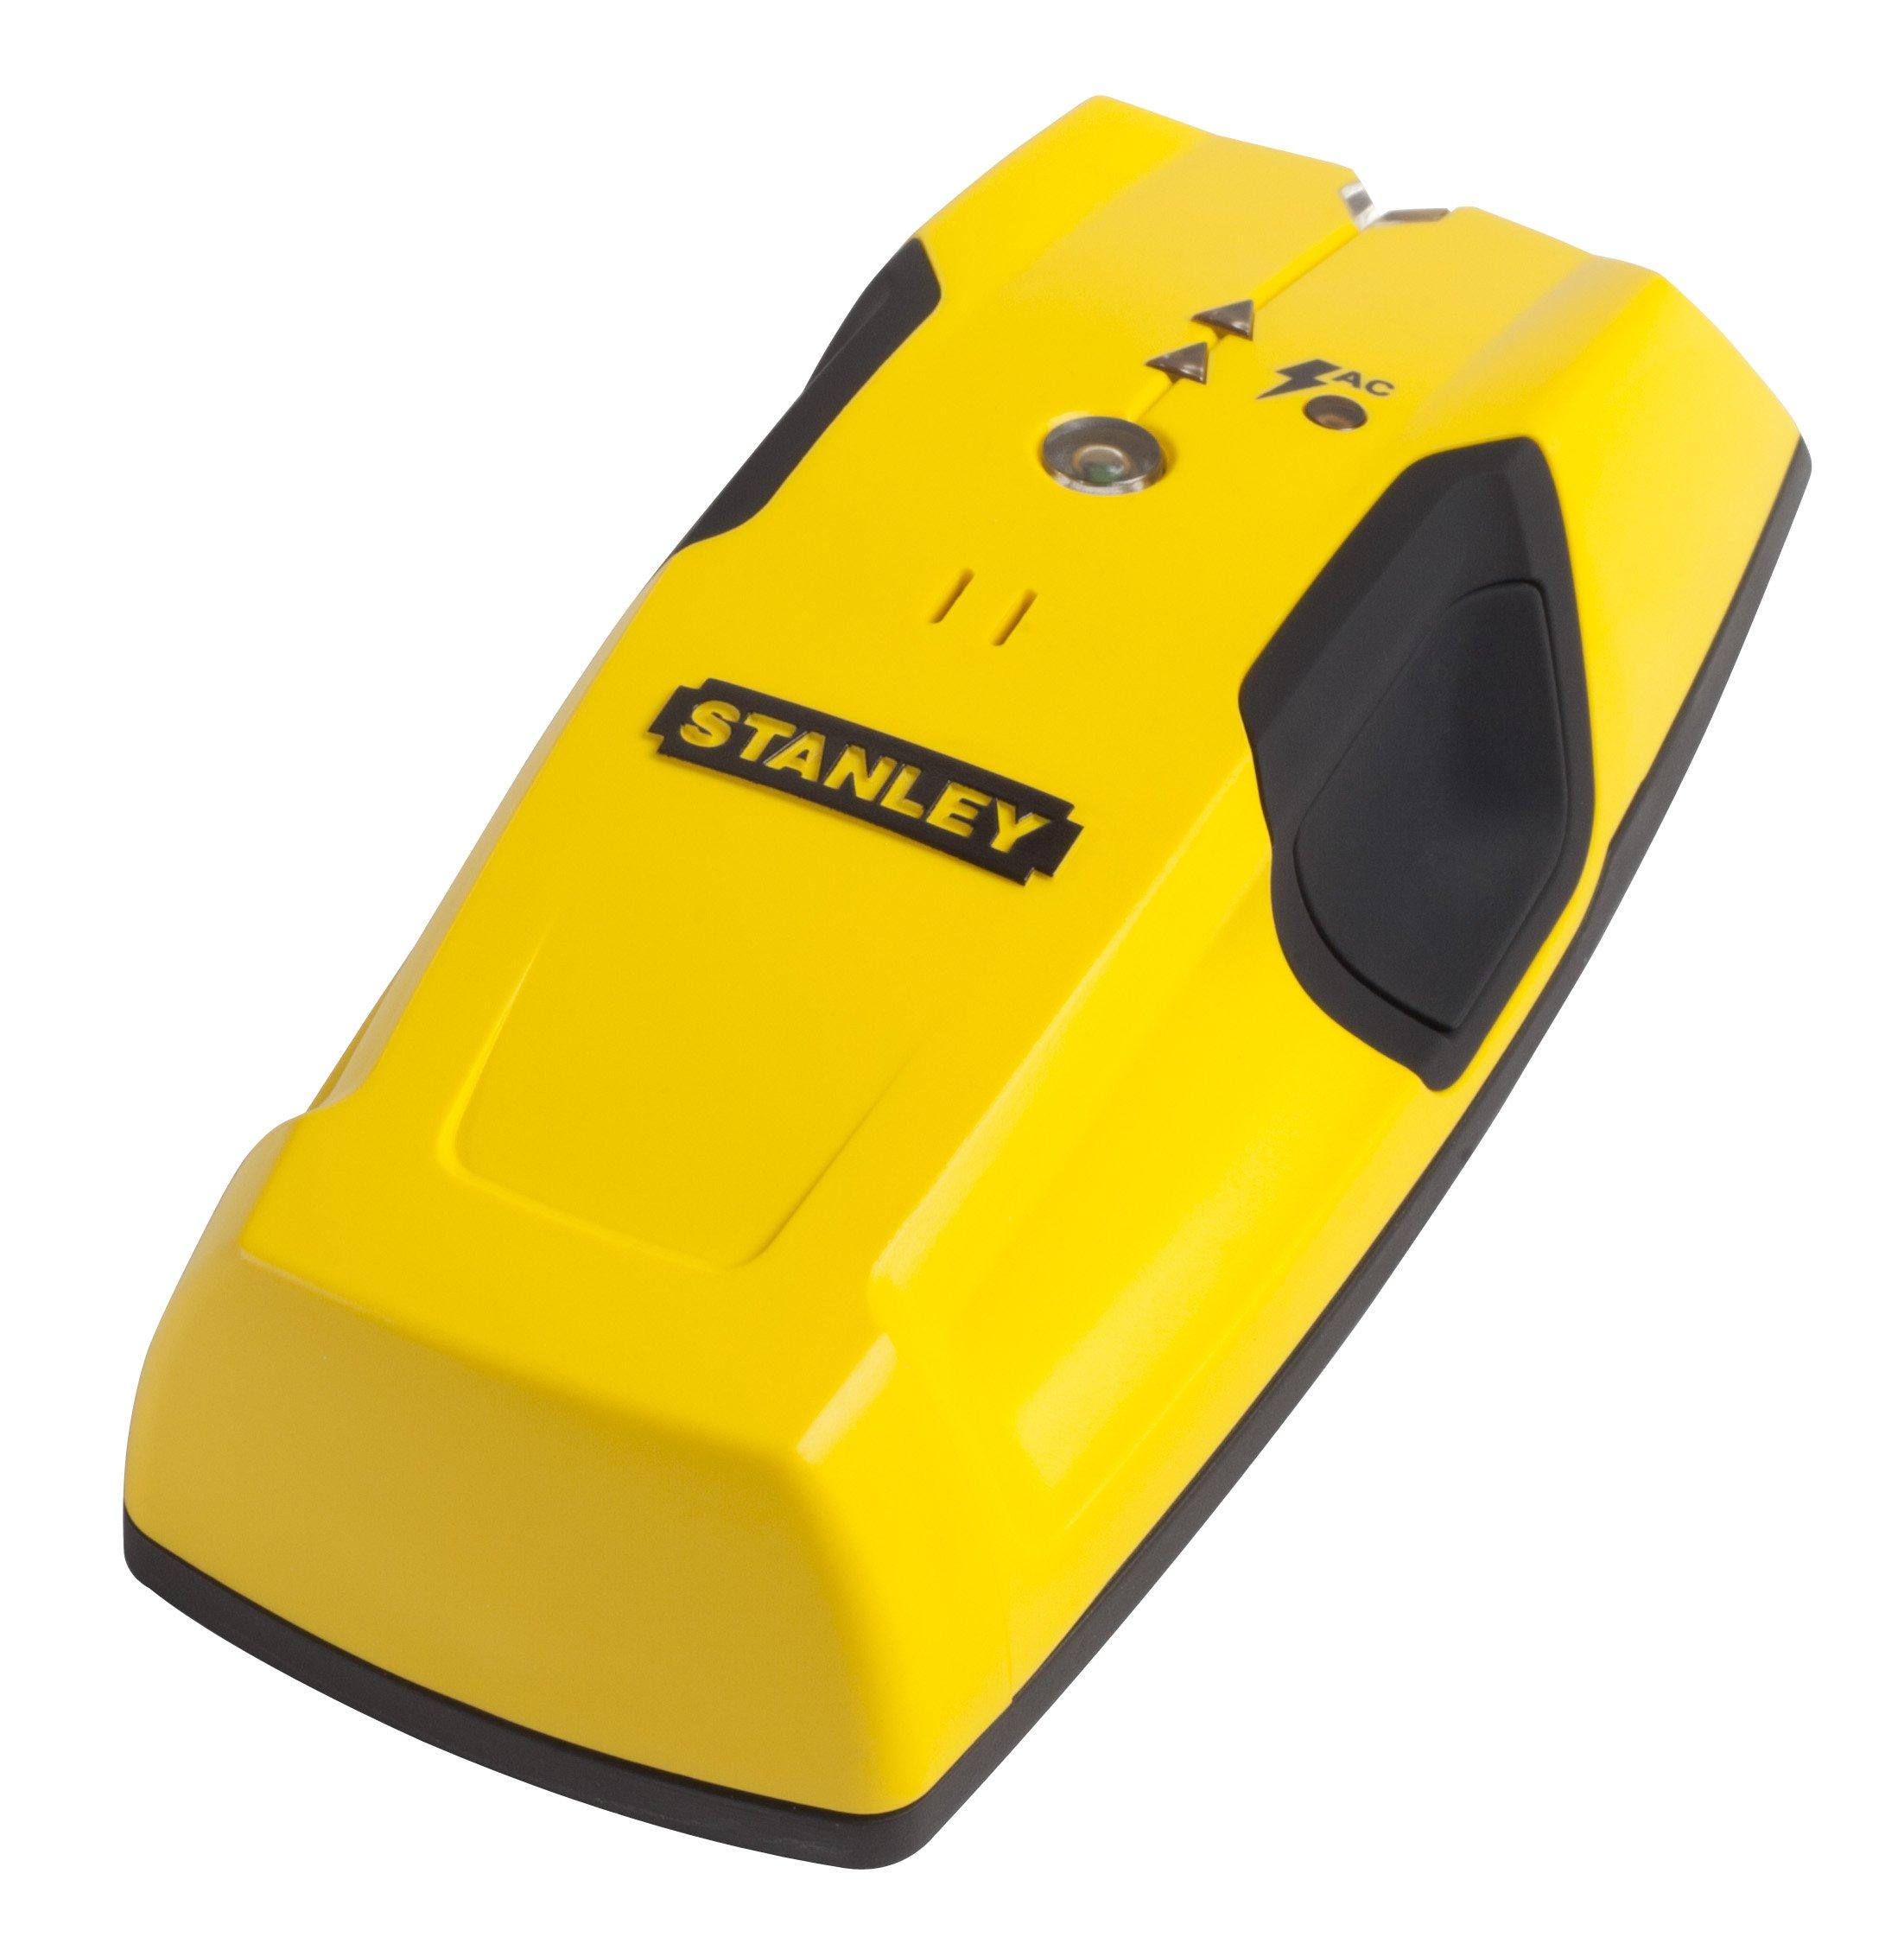 Stanley STHT0-77403 S100 Stud Sensor, Yellow/Black